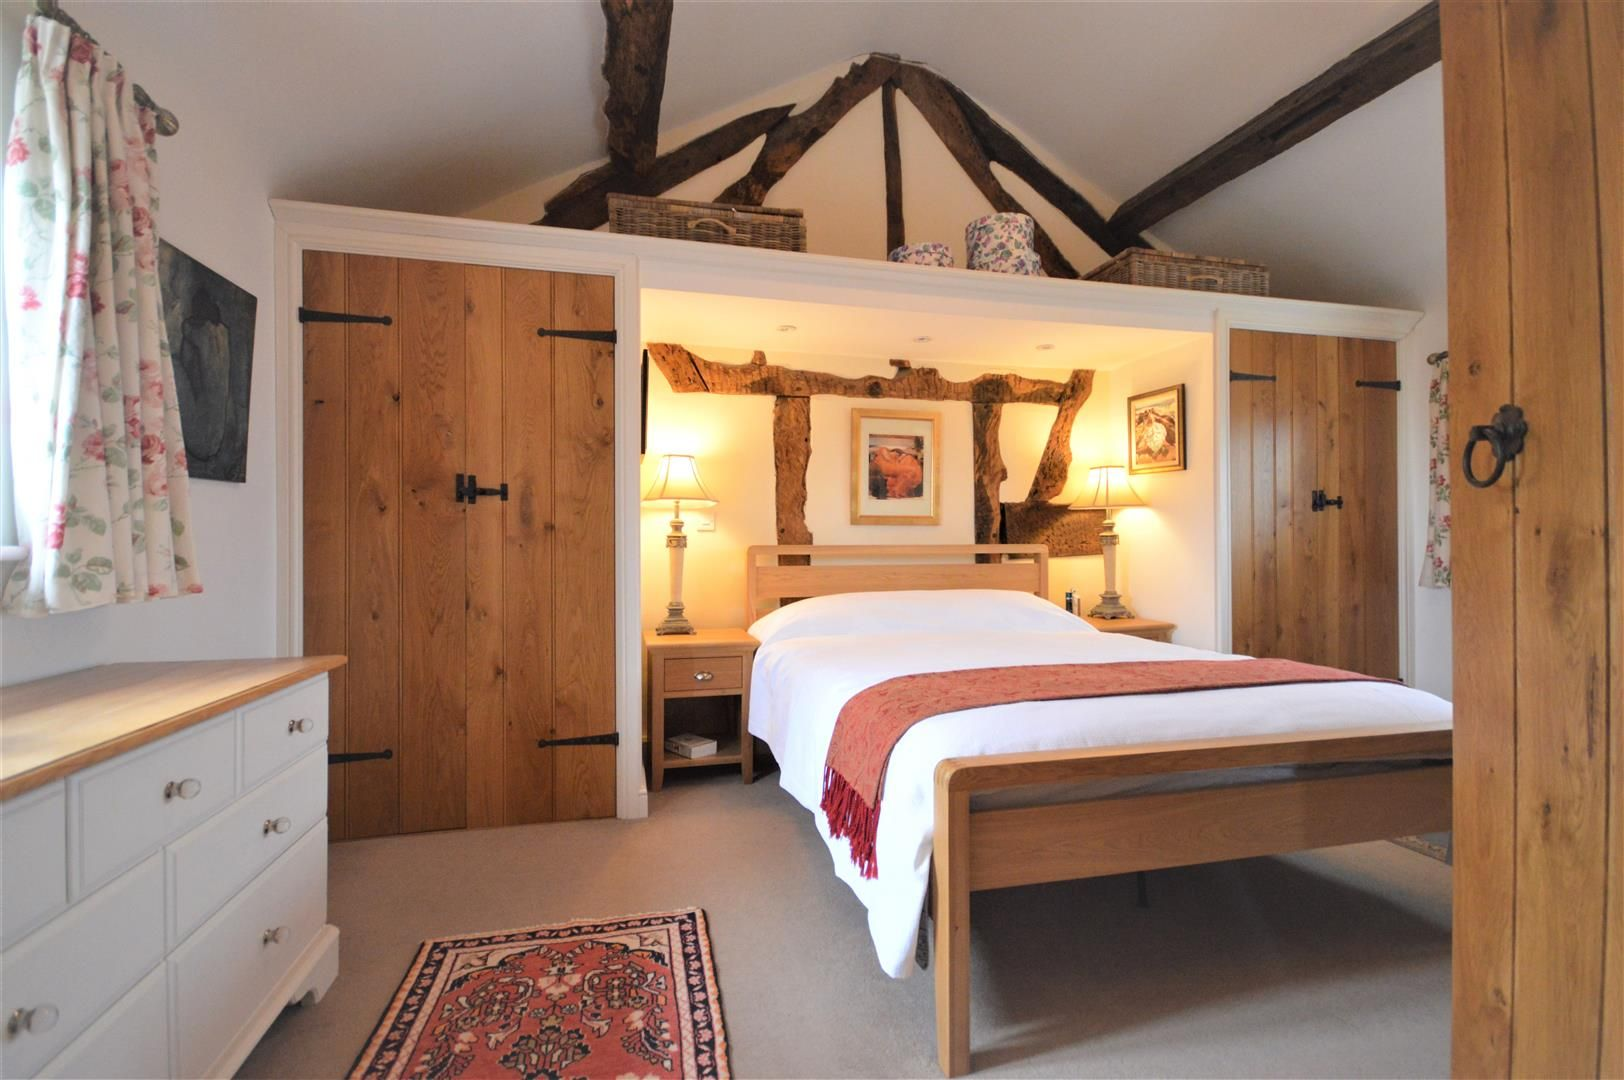 4 bed barn conversion for sale in Kingsland  - Property Image 8